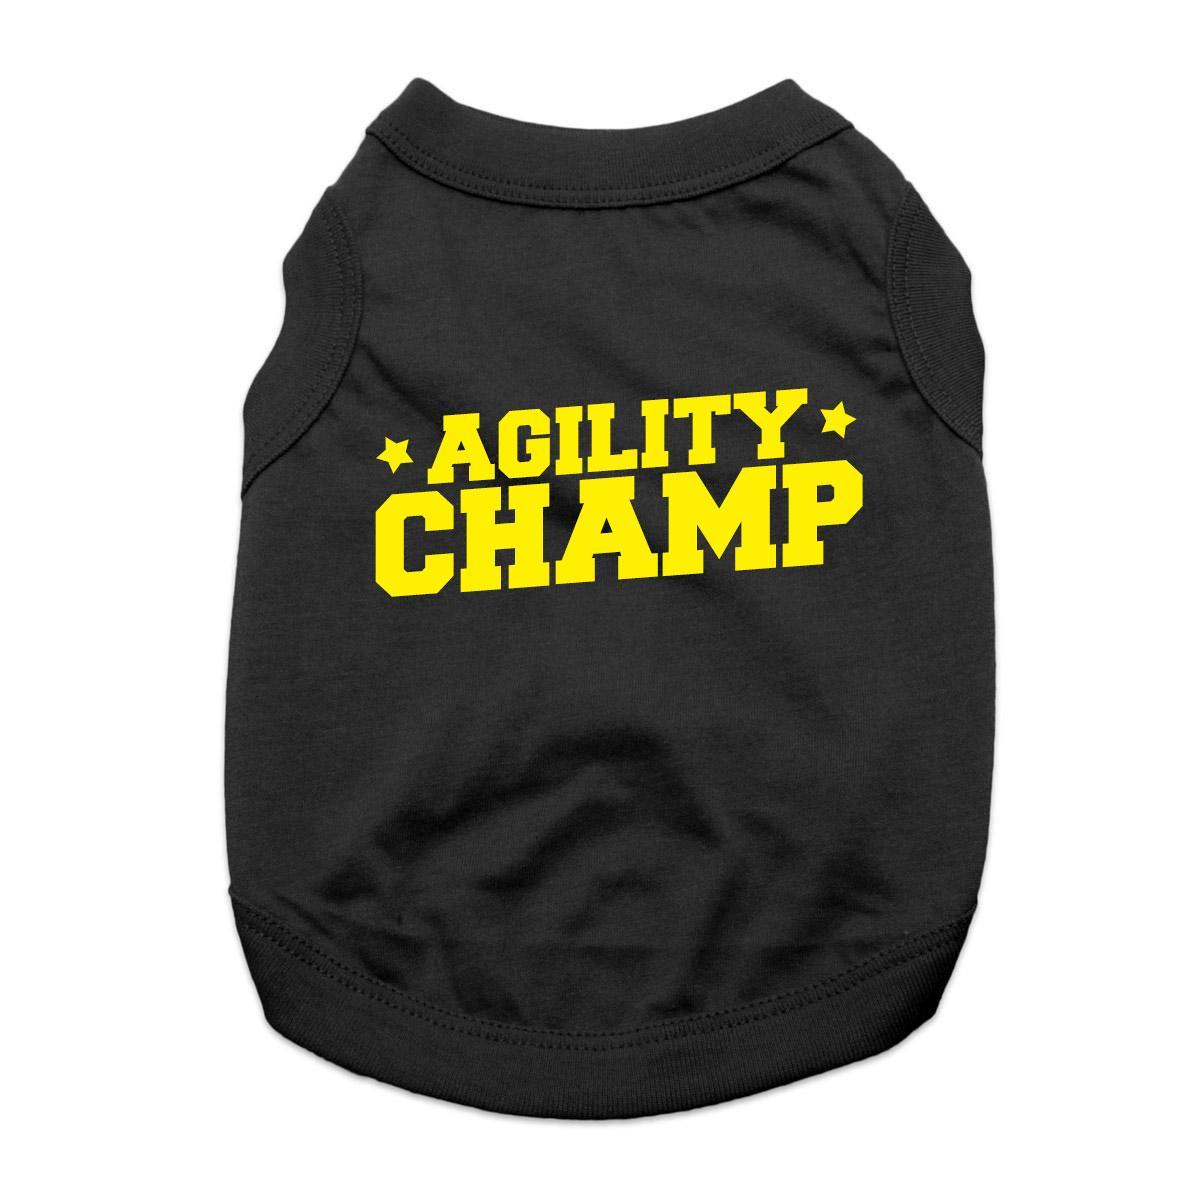 Agility Champ Dog Shirt - Black